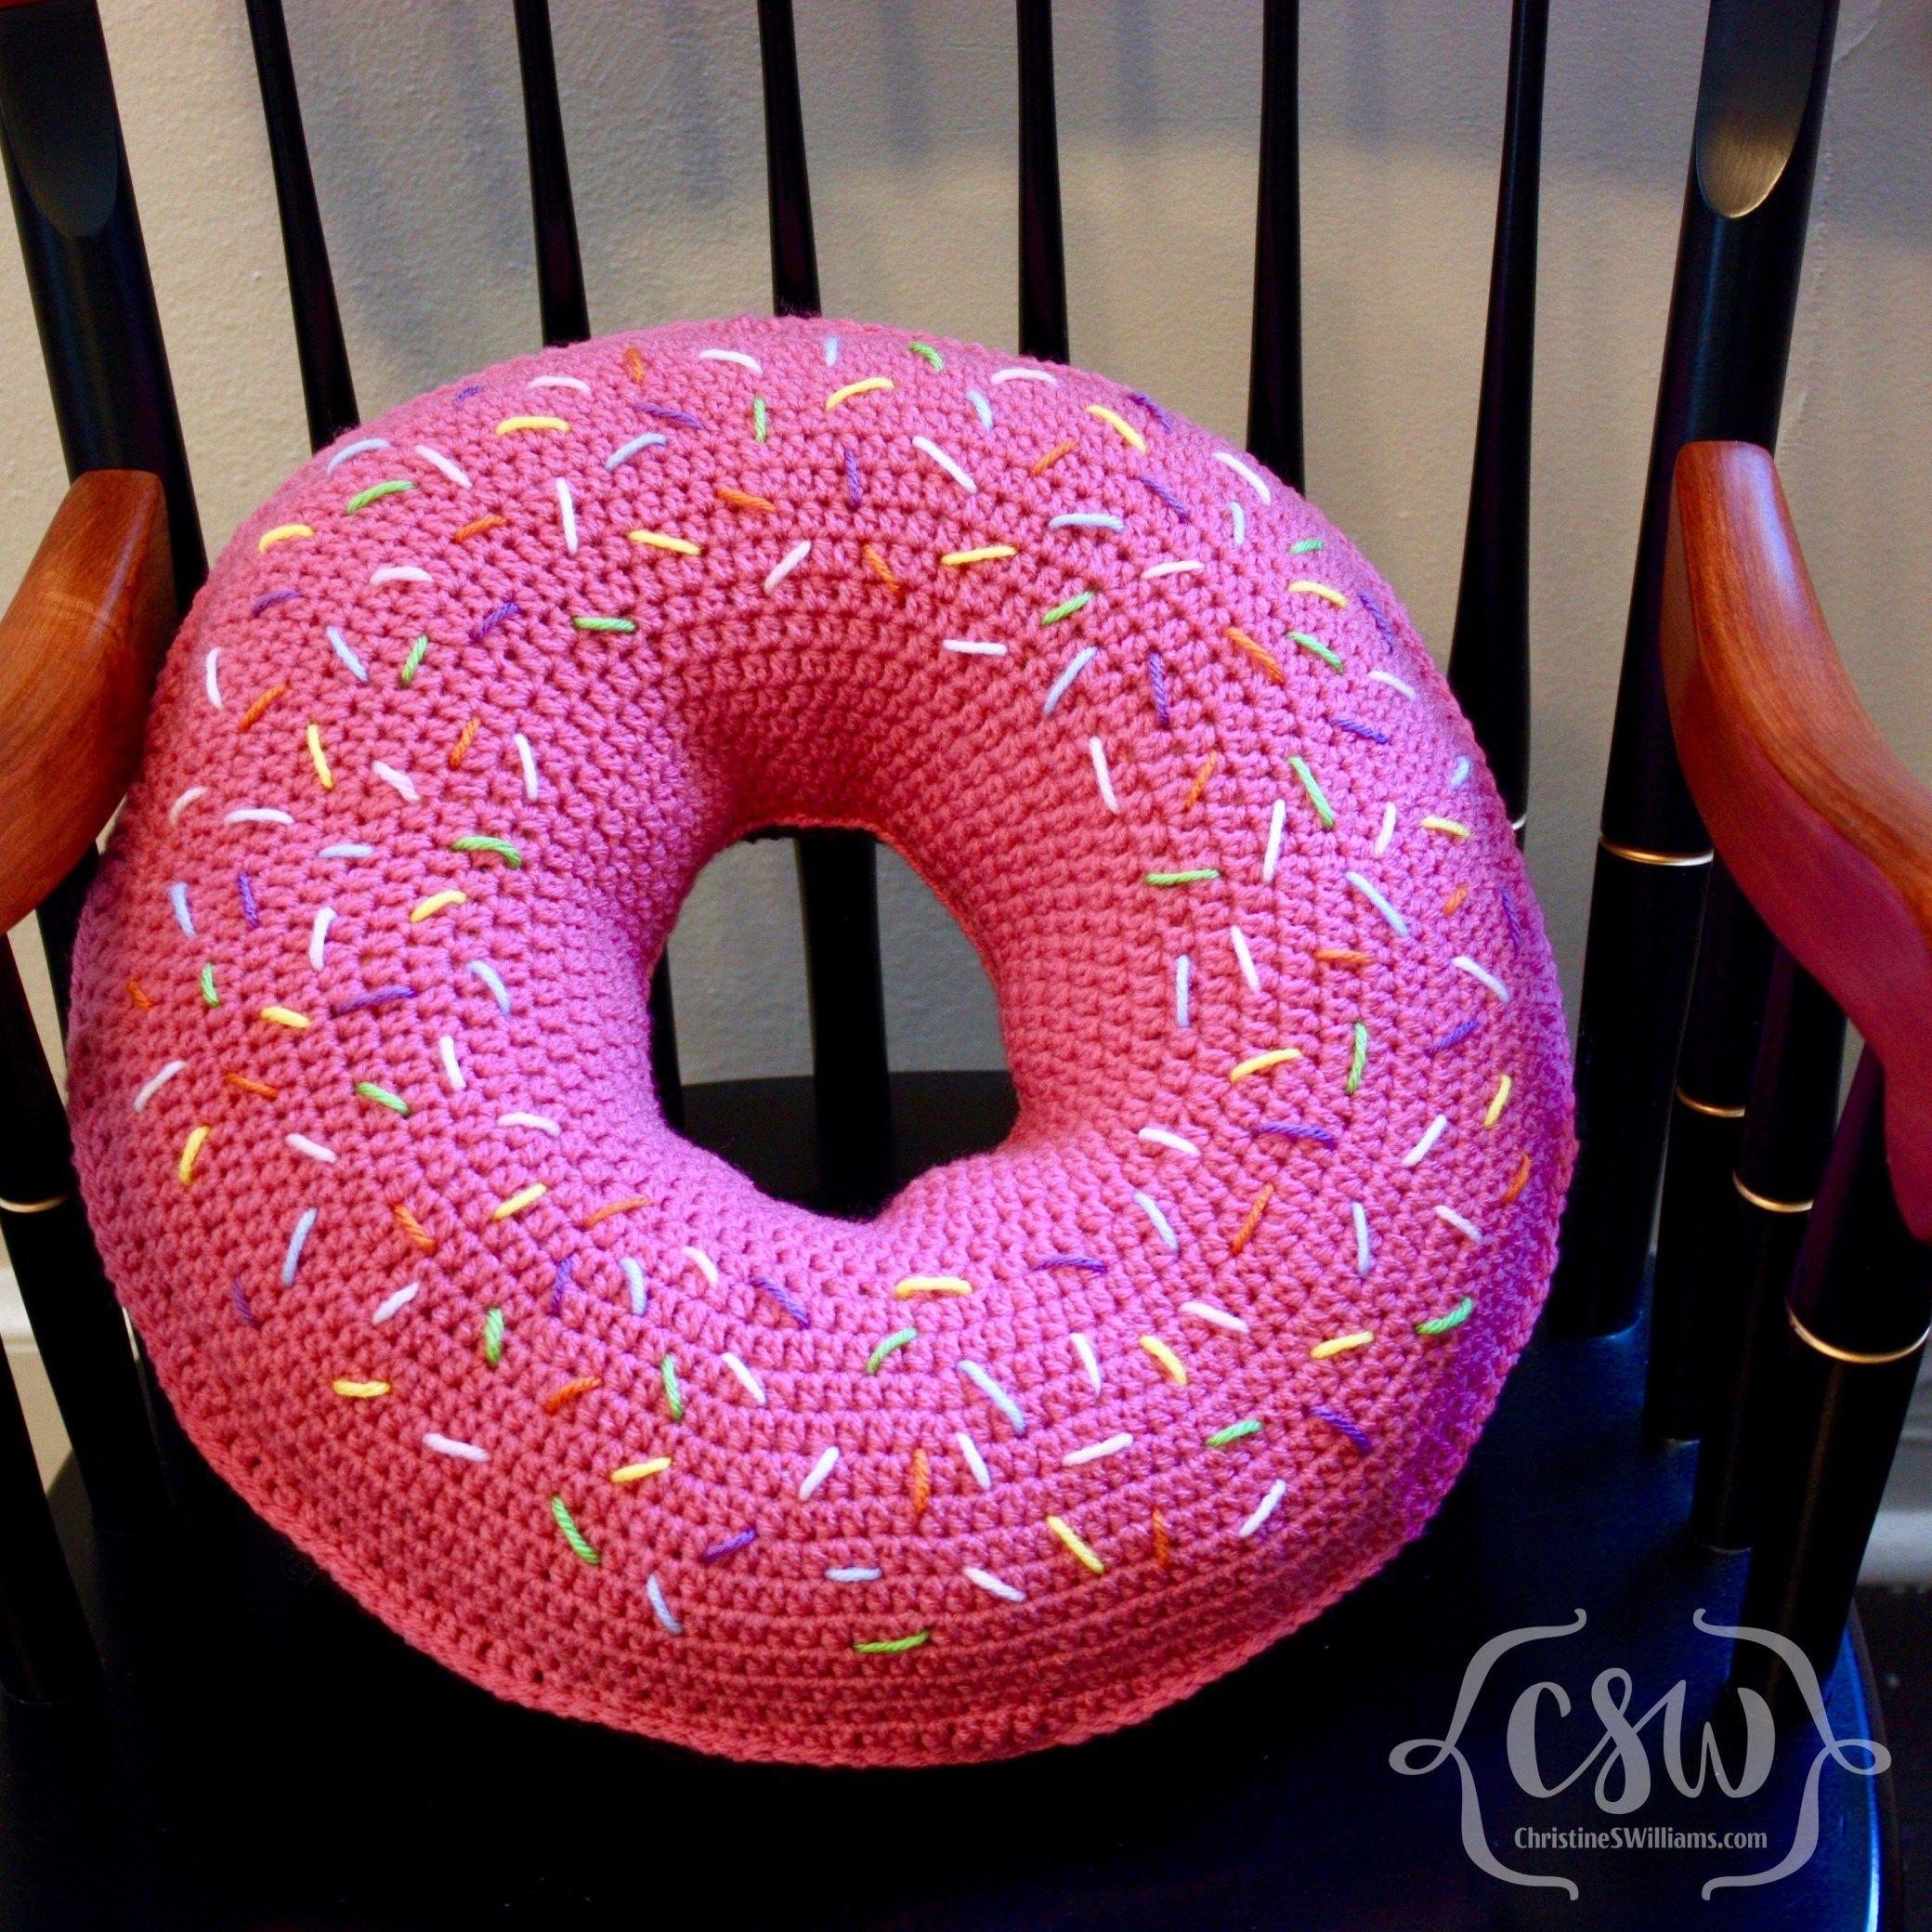 Donut Pillow Donut Cushion Pillows Crochet Cushions